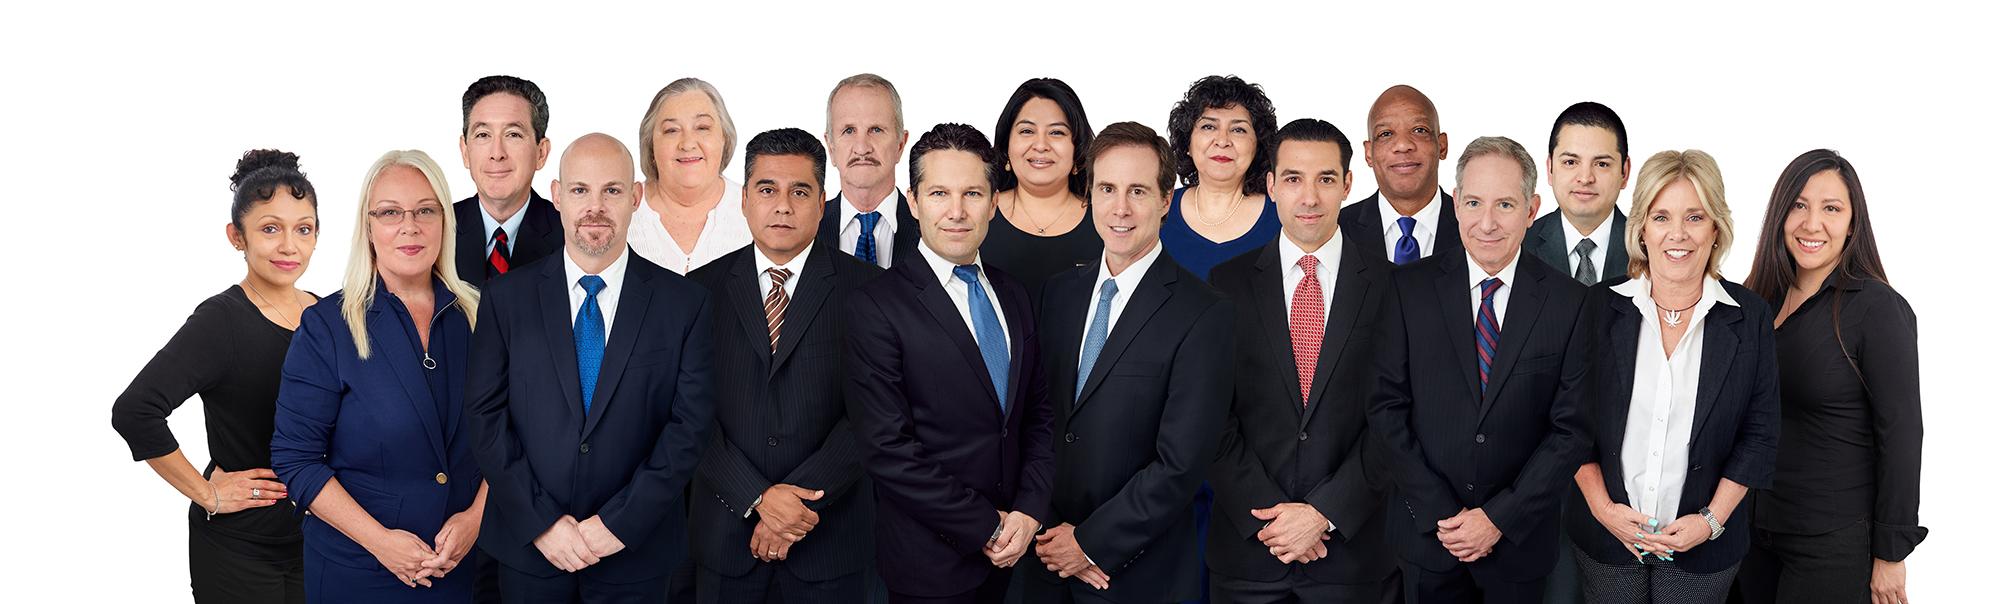 The Trustee Group (from left to right): Elsa Abarca, Louise Dawson, Phil Hernandez, Jeffrey Engerman, Joanne Byrd, Rick Marquis, Dan Woodard, Kevin Singer, Sandy Leon, John Rachlin, Jila Gharehbaghi, Scott Yahraus, Don Del Rio, David Kamm, Jeff Castillo, Pam Donner, Jackie Angel